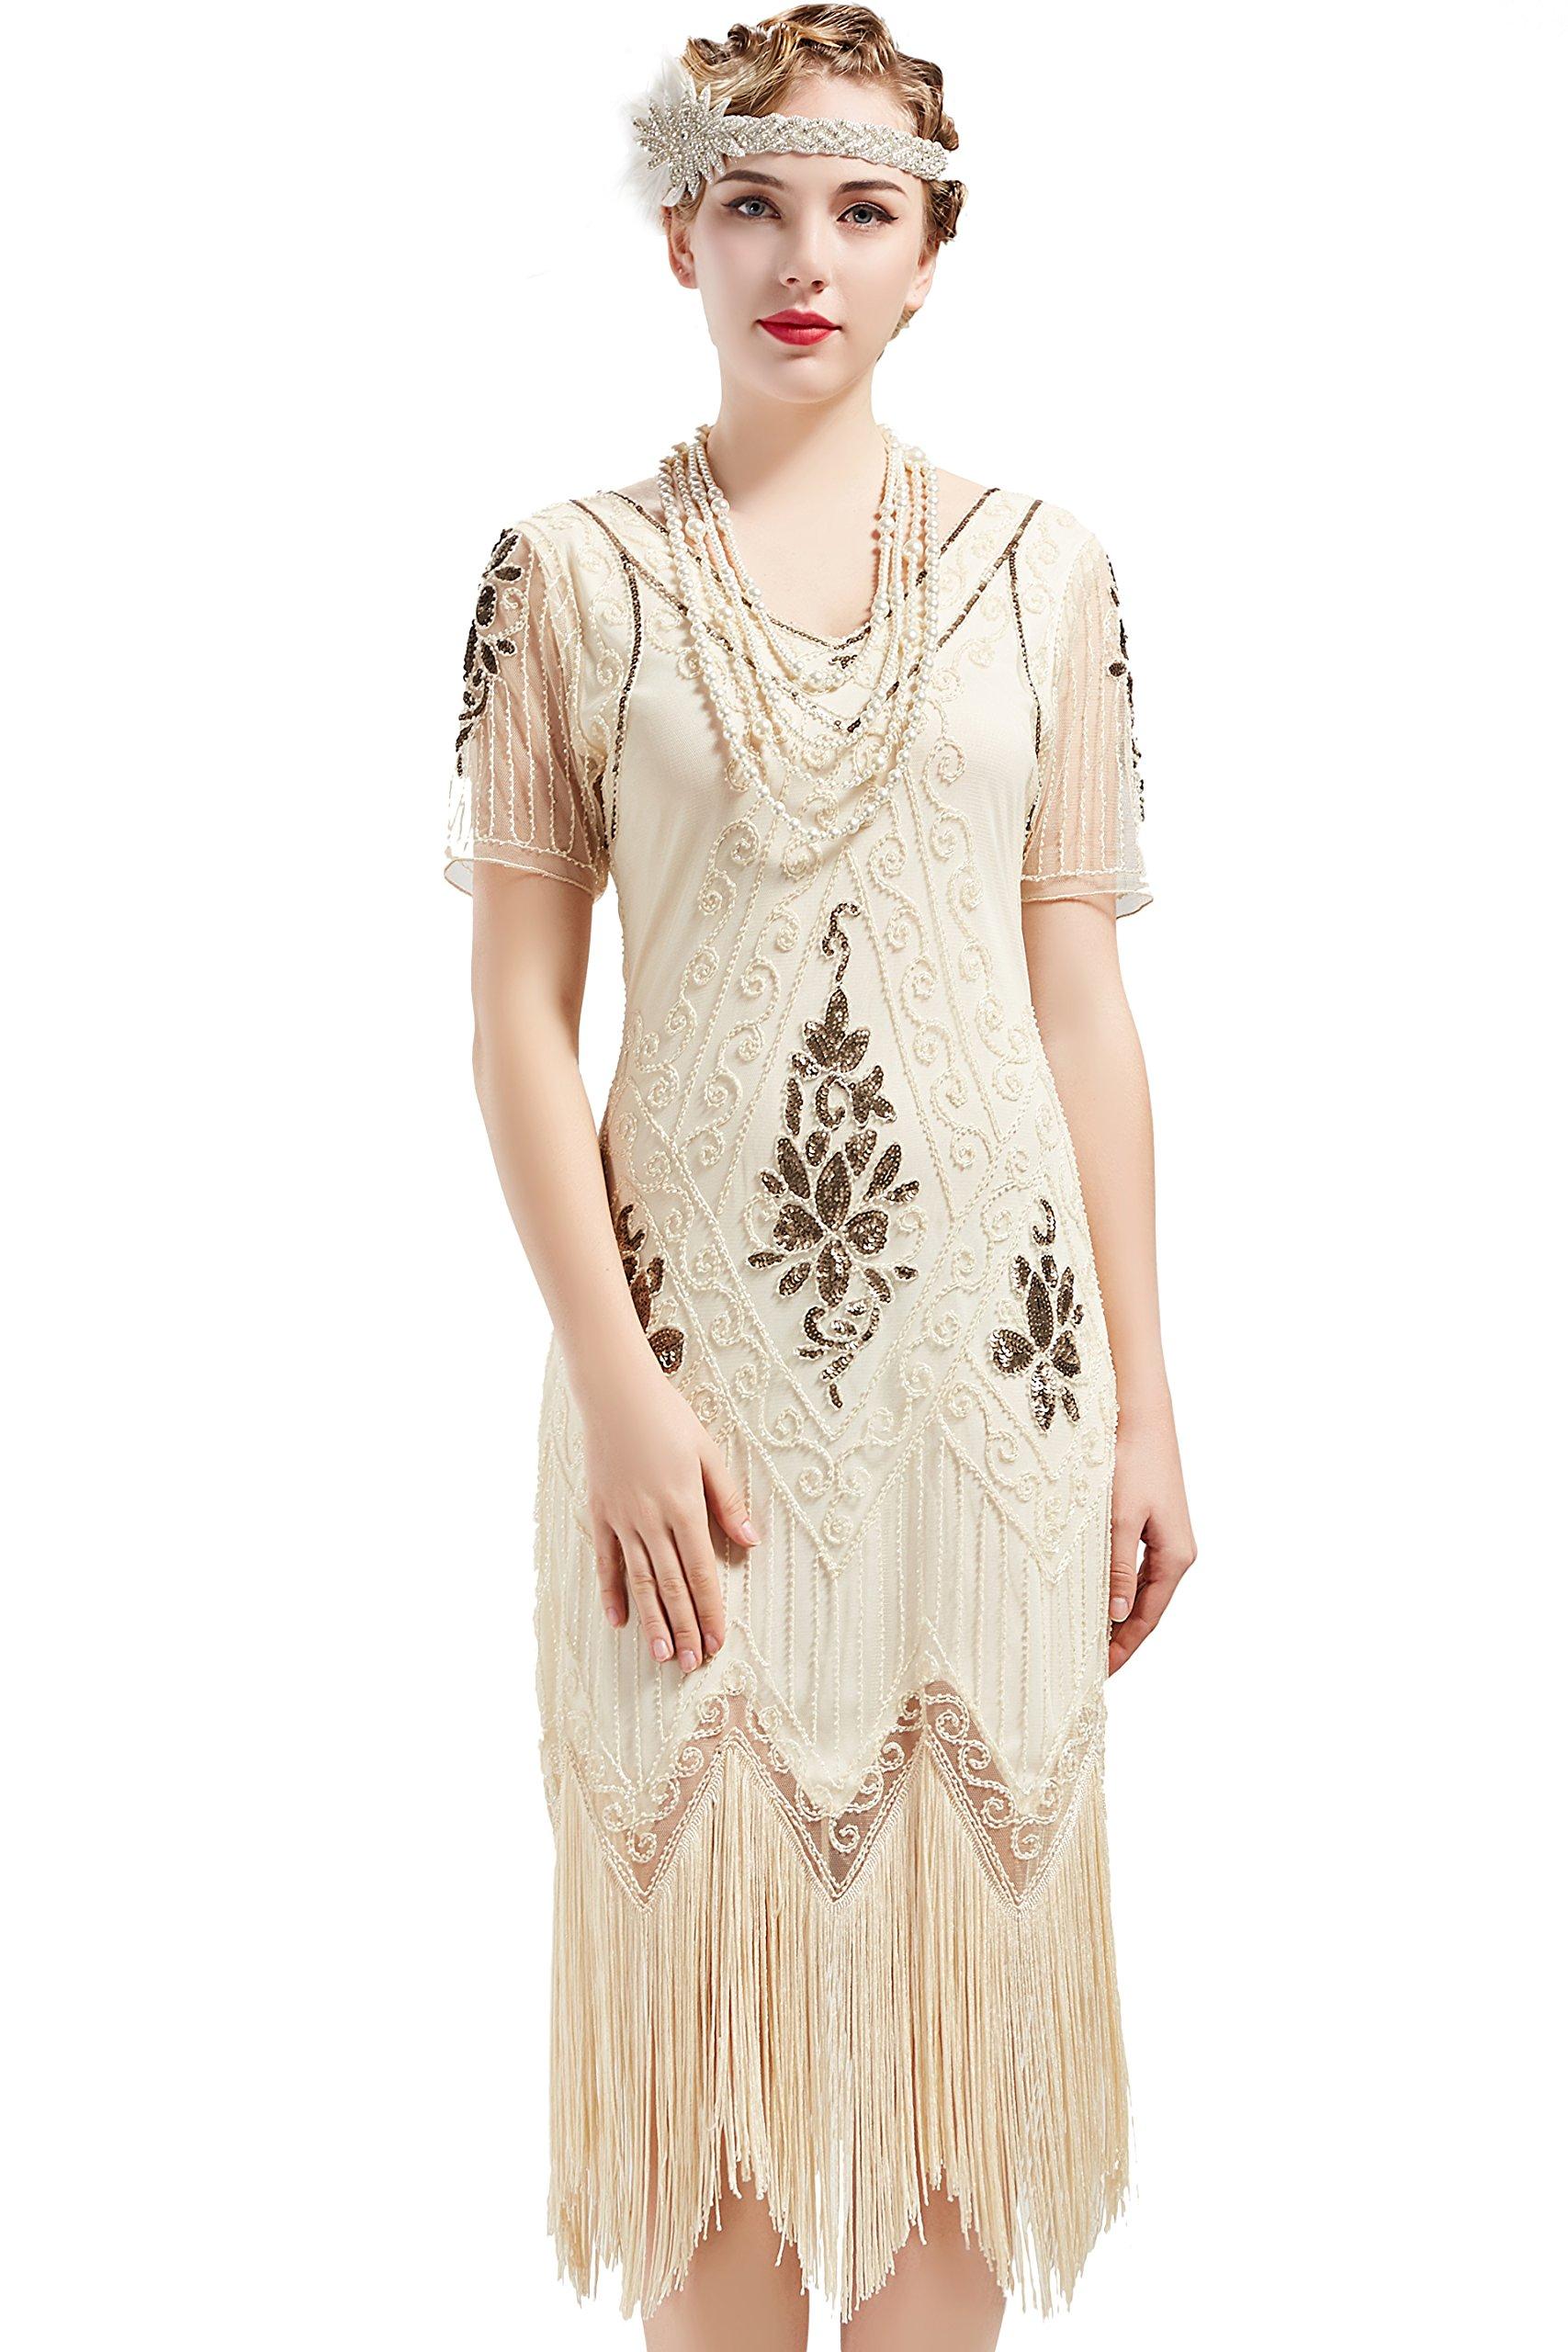 BABEYOND 1920s Art Deco Fringed Sequin Dress Roaring 20s Flapper Fancy Dress Gatsby Costume Dress Vintage Beaded Evening Dress (Beige, Large)